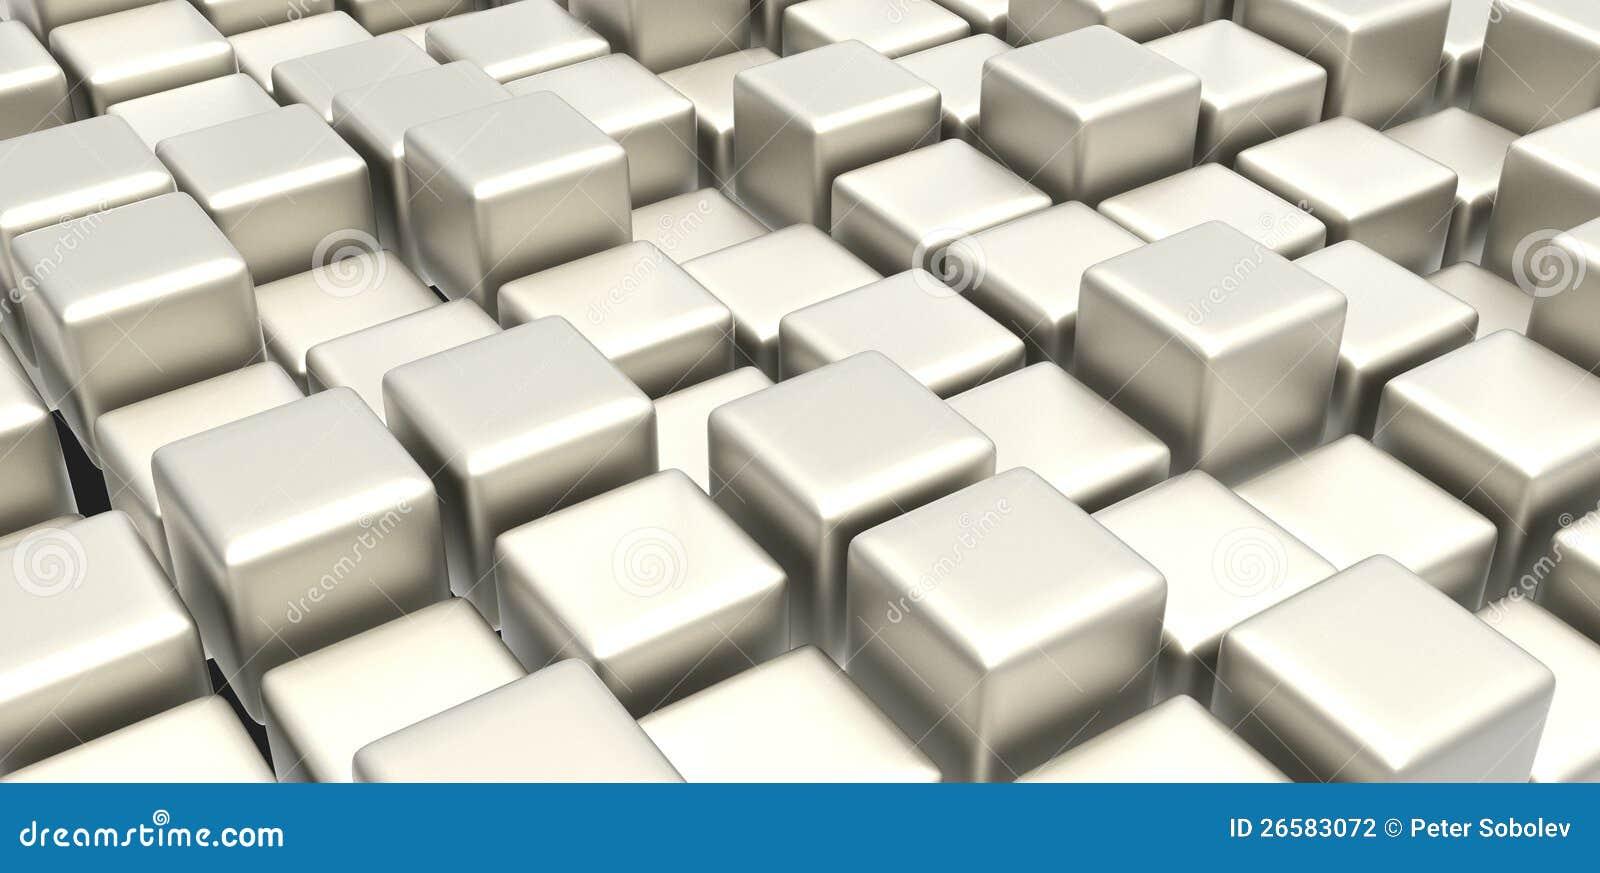 Cubos do metal branco